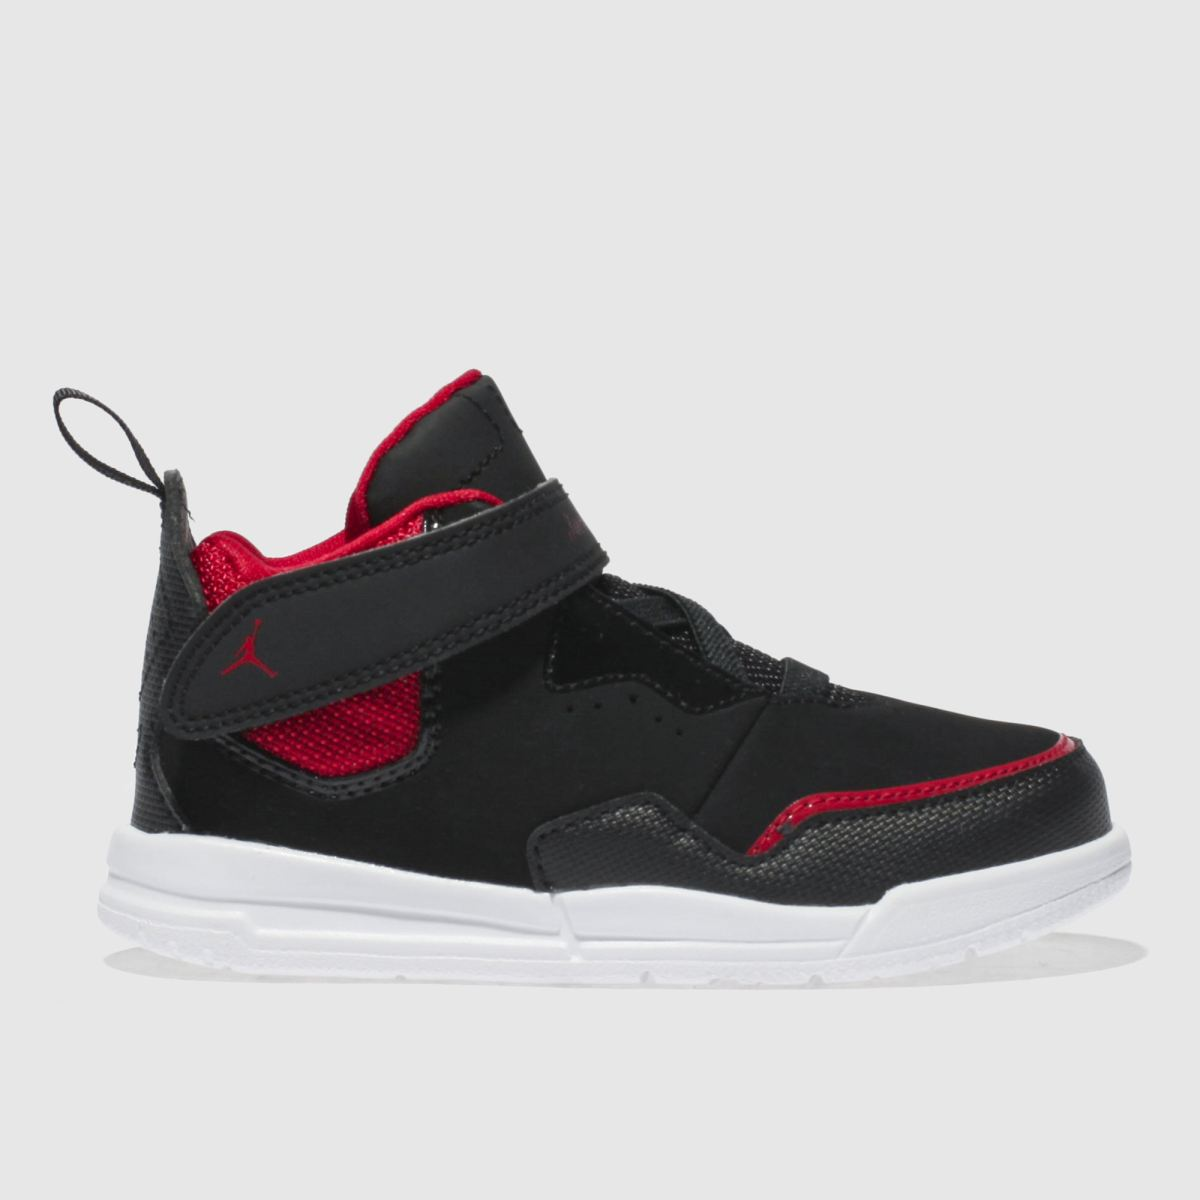 1a186b123cf0 Nike Jordan Black   Red Courtside 23 Trainers Toddler